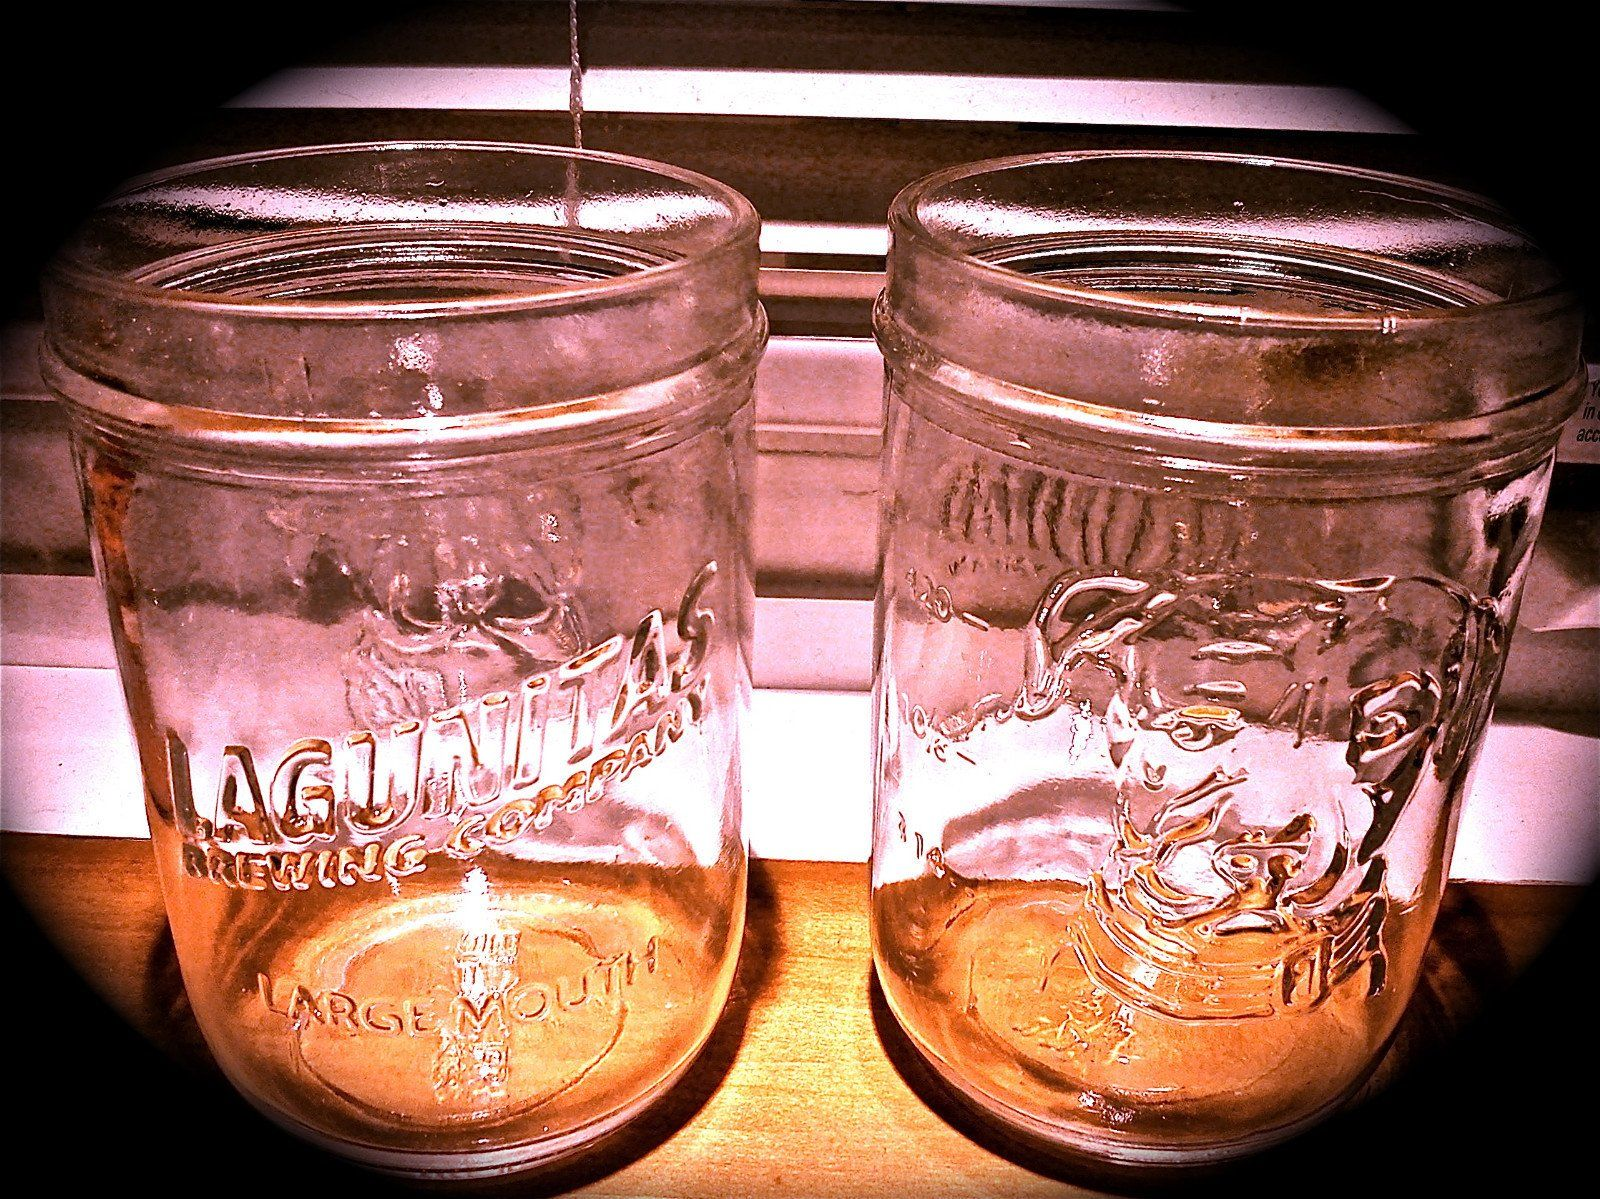 LAGUNITAS BREWING Brewery ~ NEW ~ Embossed DOG ~ Mason Jar Beer Pint Glass Z